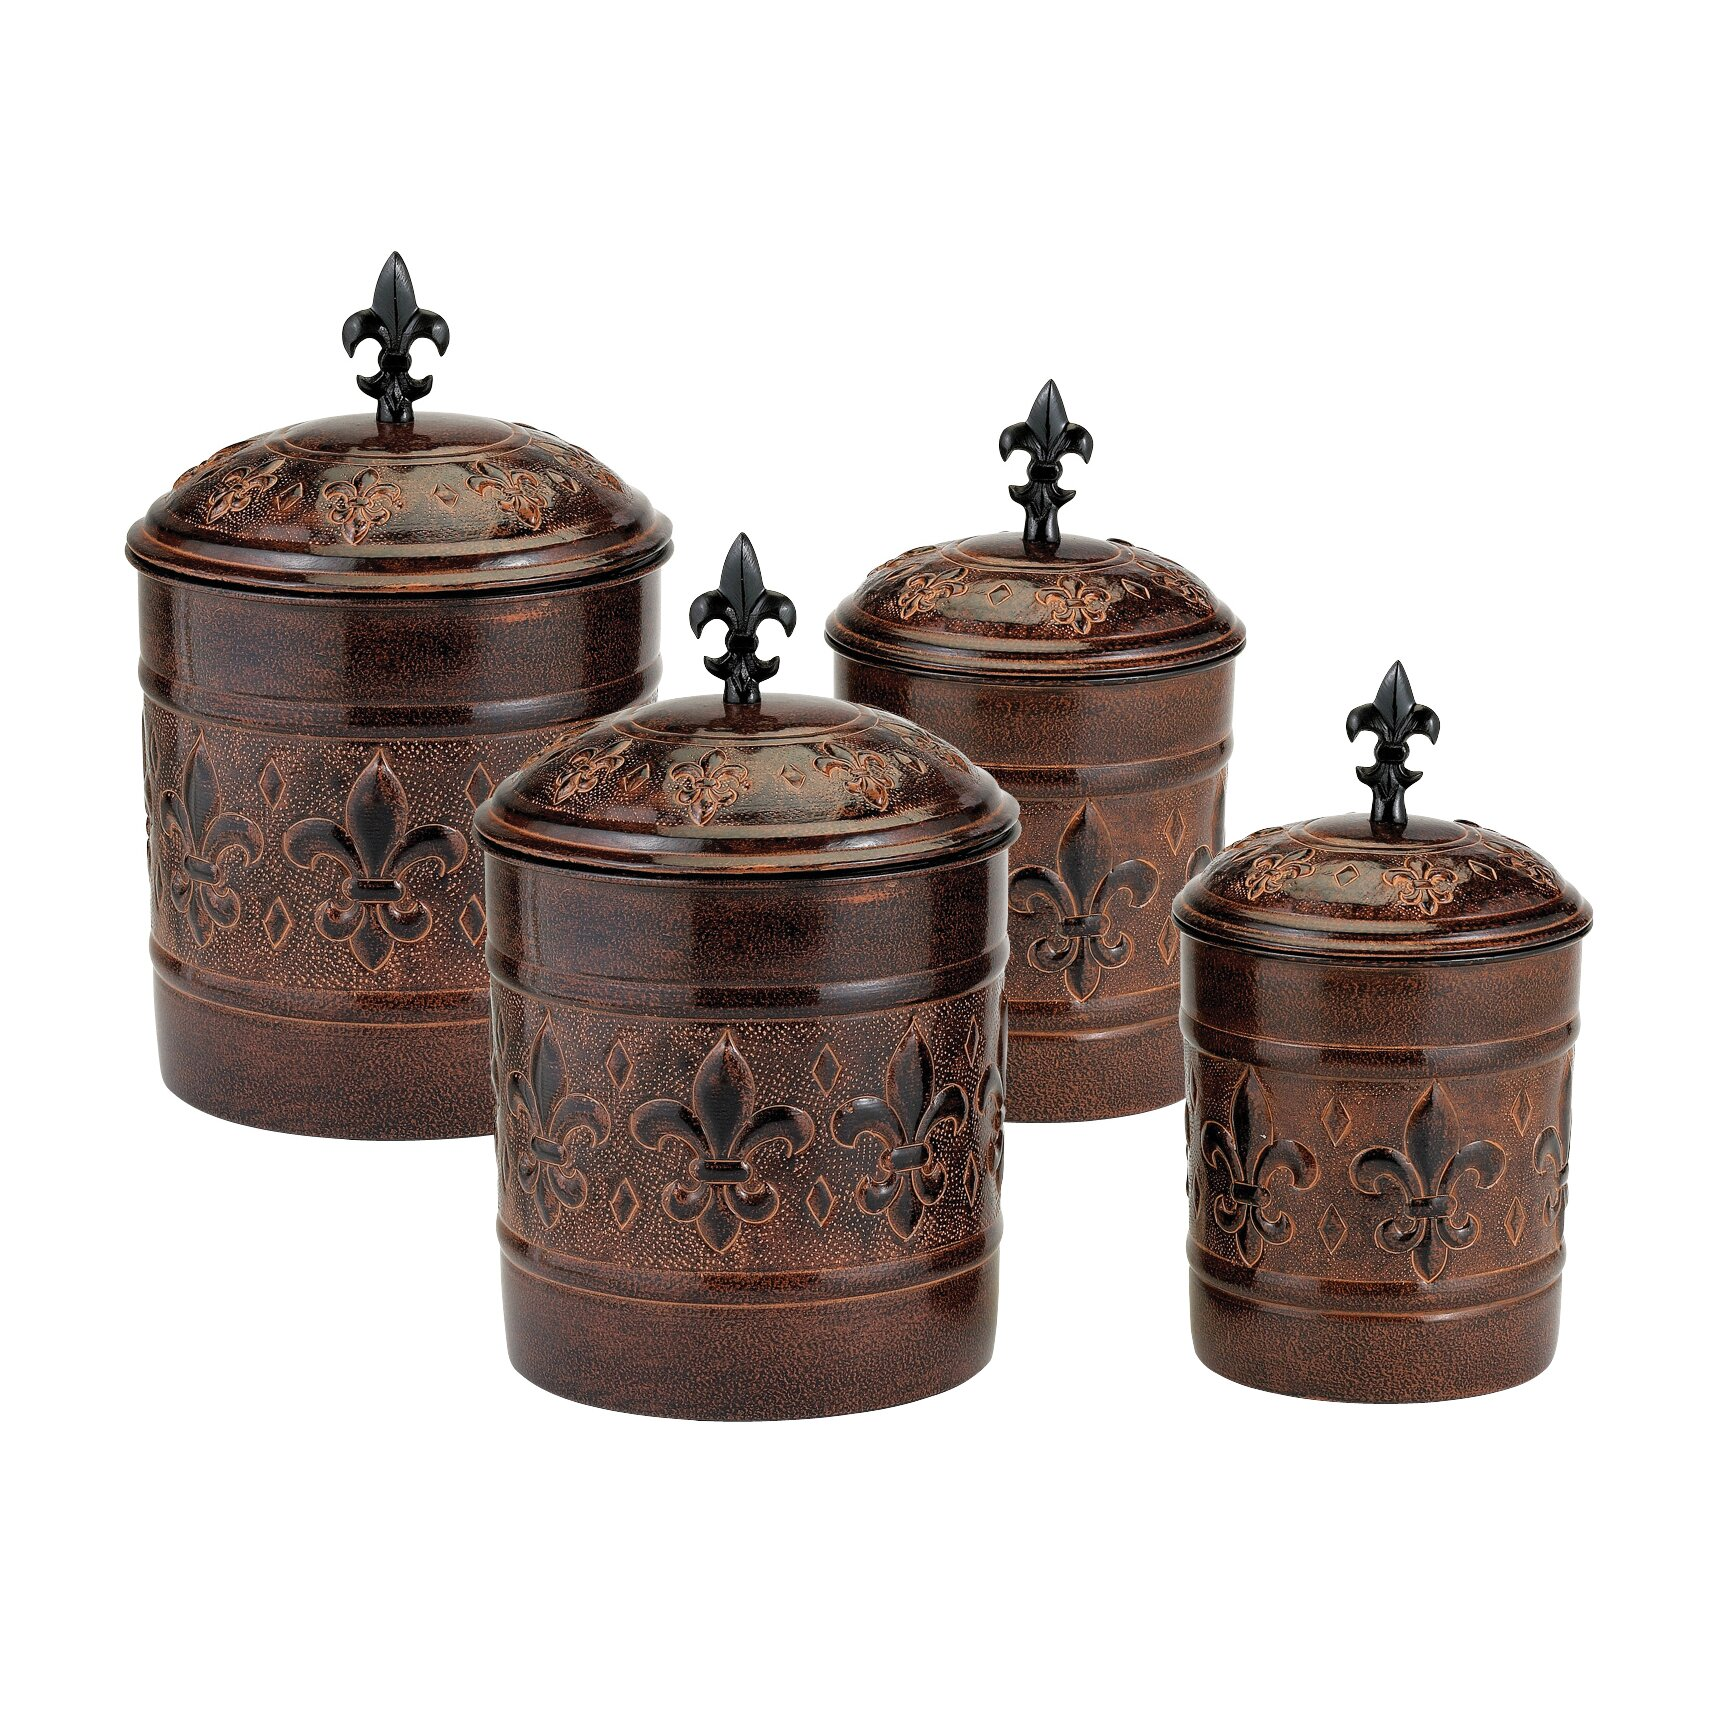 Old Dutch Versailles 4piece Decorative Canister Set